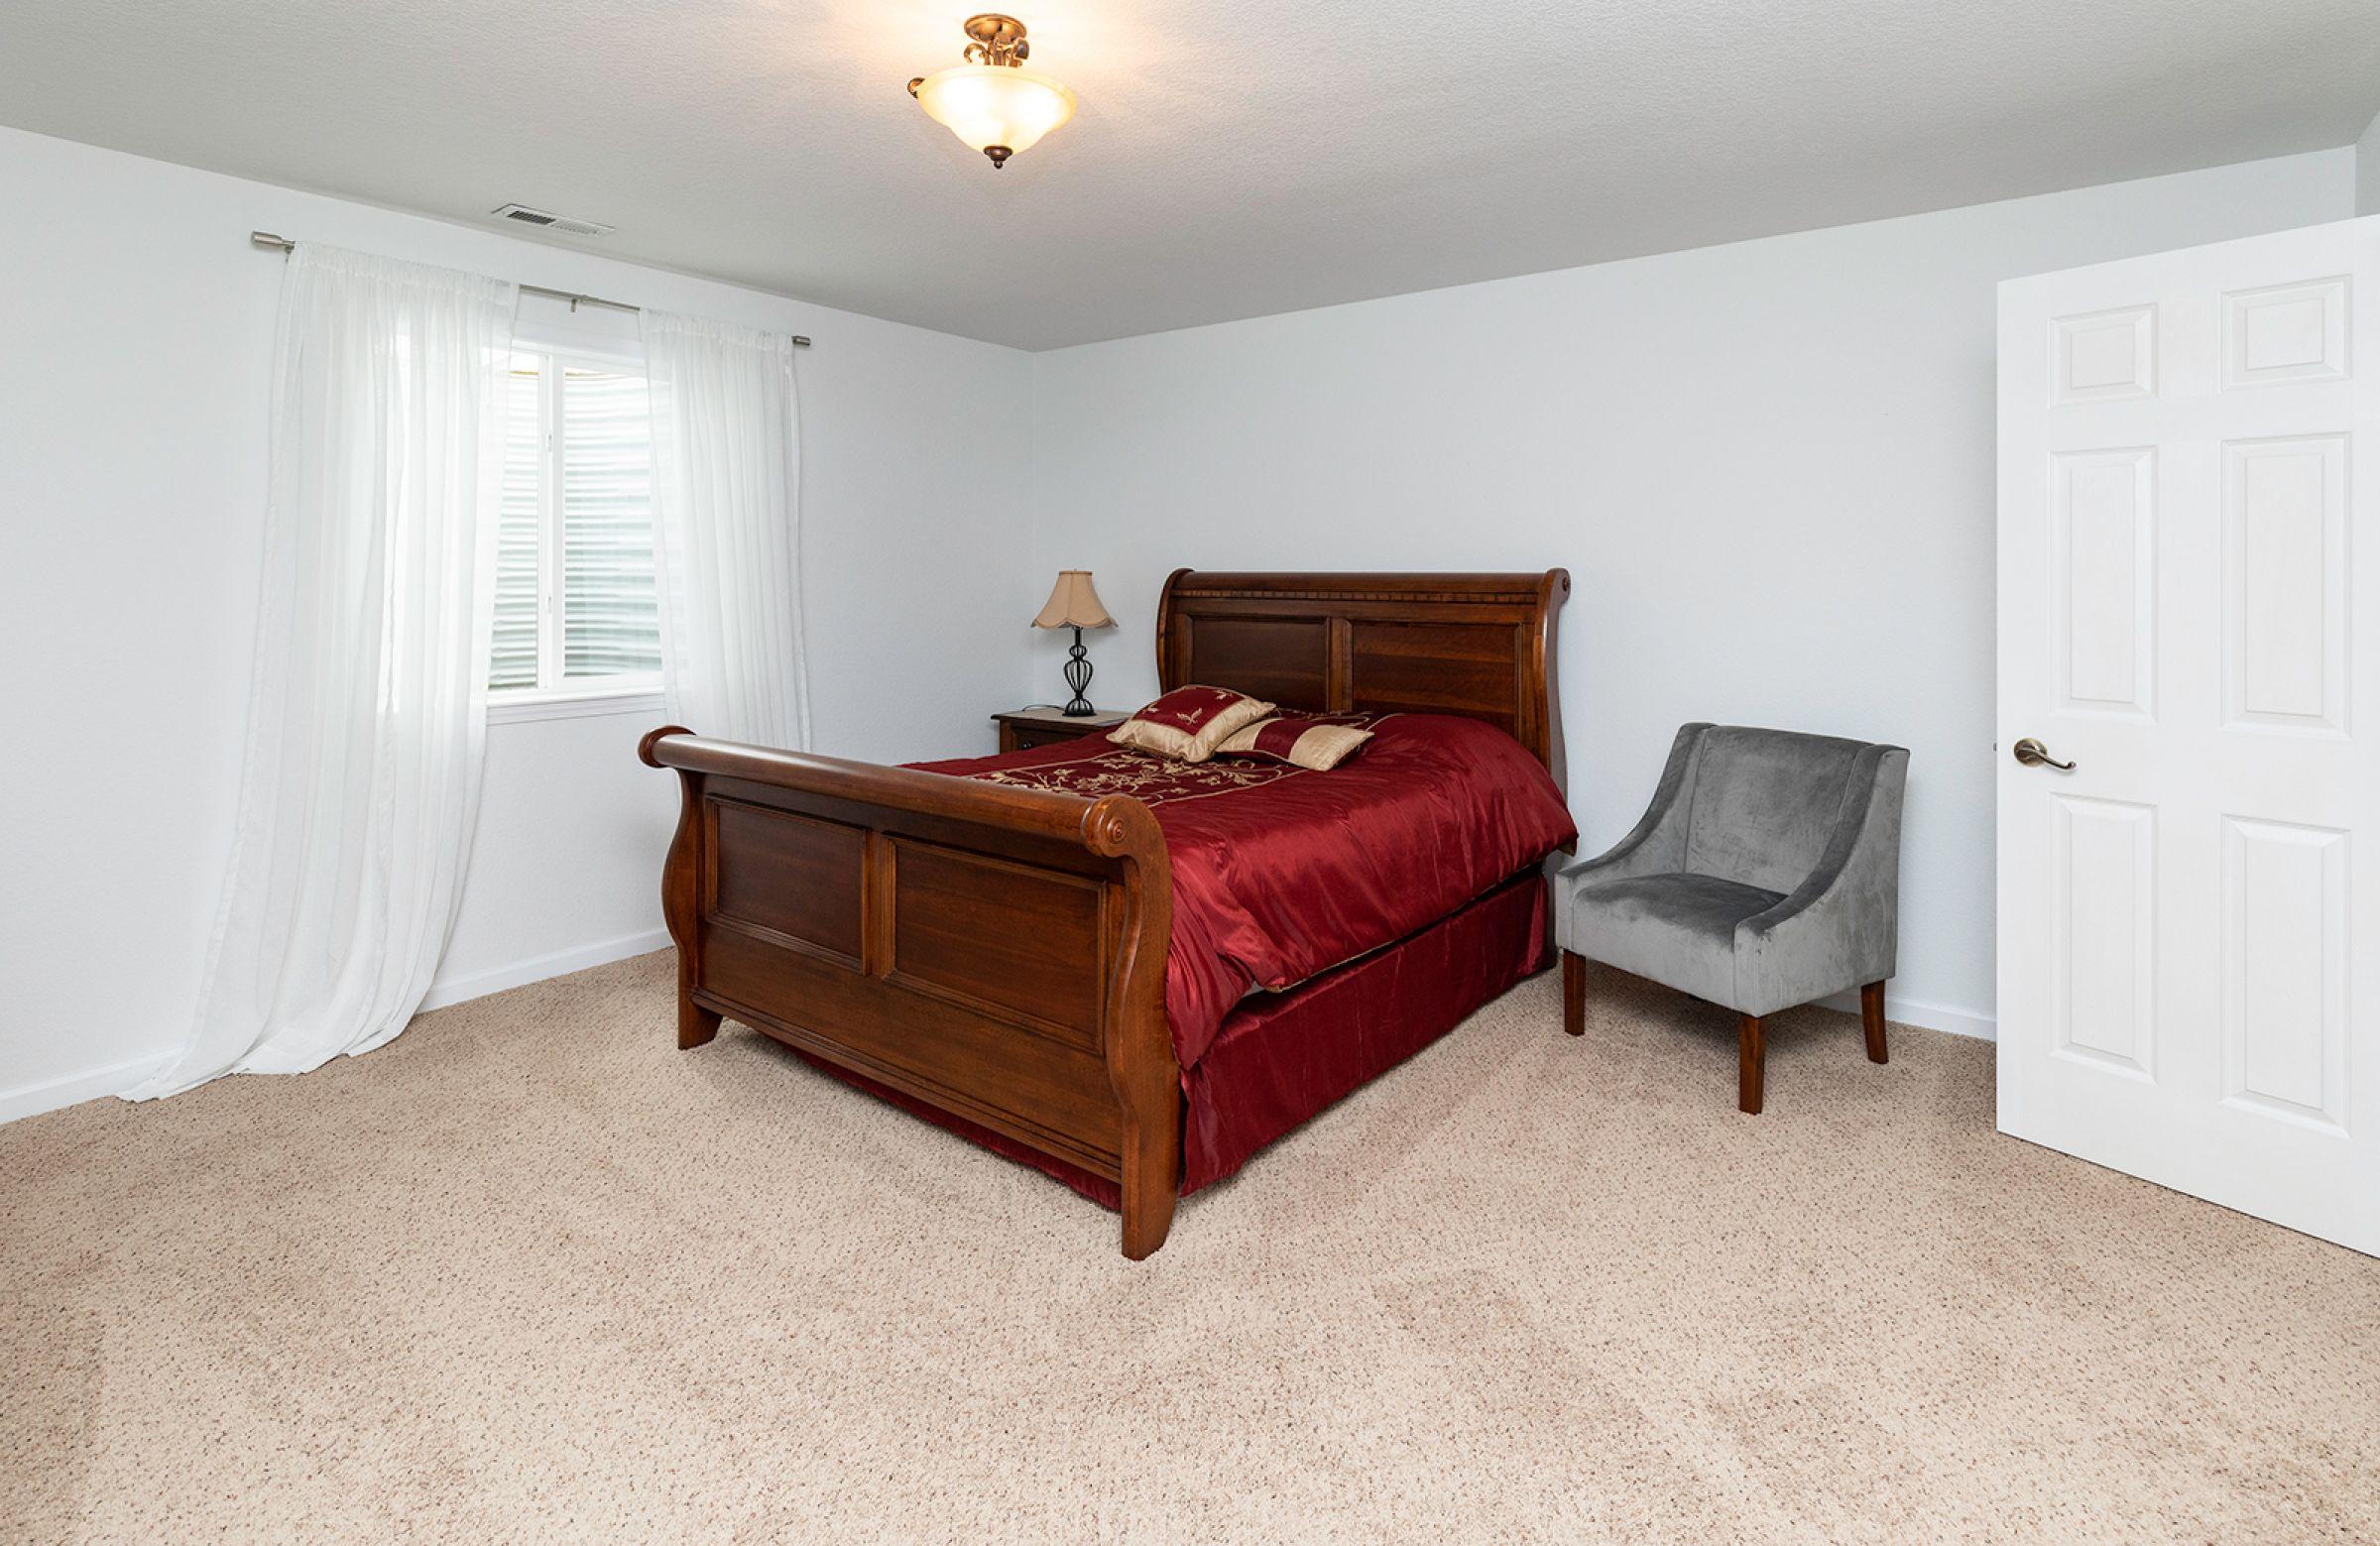 residential-polk-county-iowa-0-acres-listing-number-15458-3-2021-04-11-141038.jpg